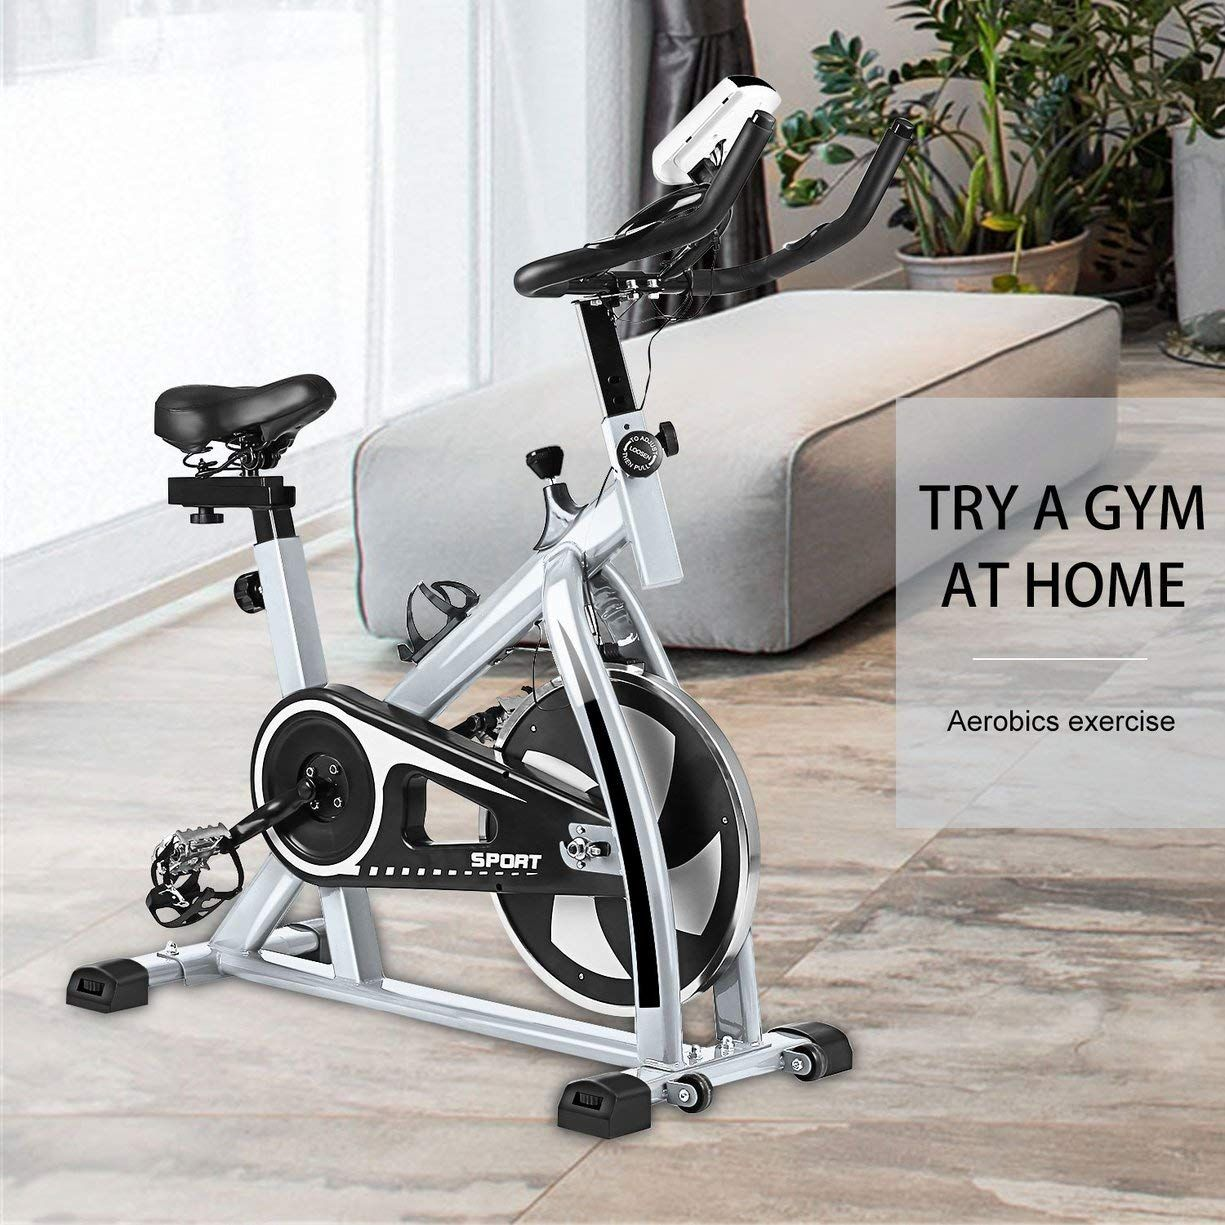 40lb Flywheel Chain Drive Pro Indoor Cycling Exercise Bike